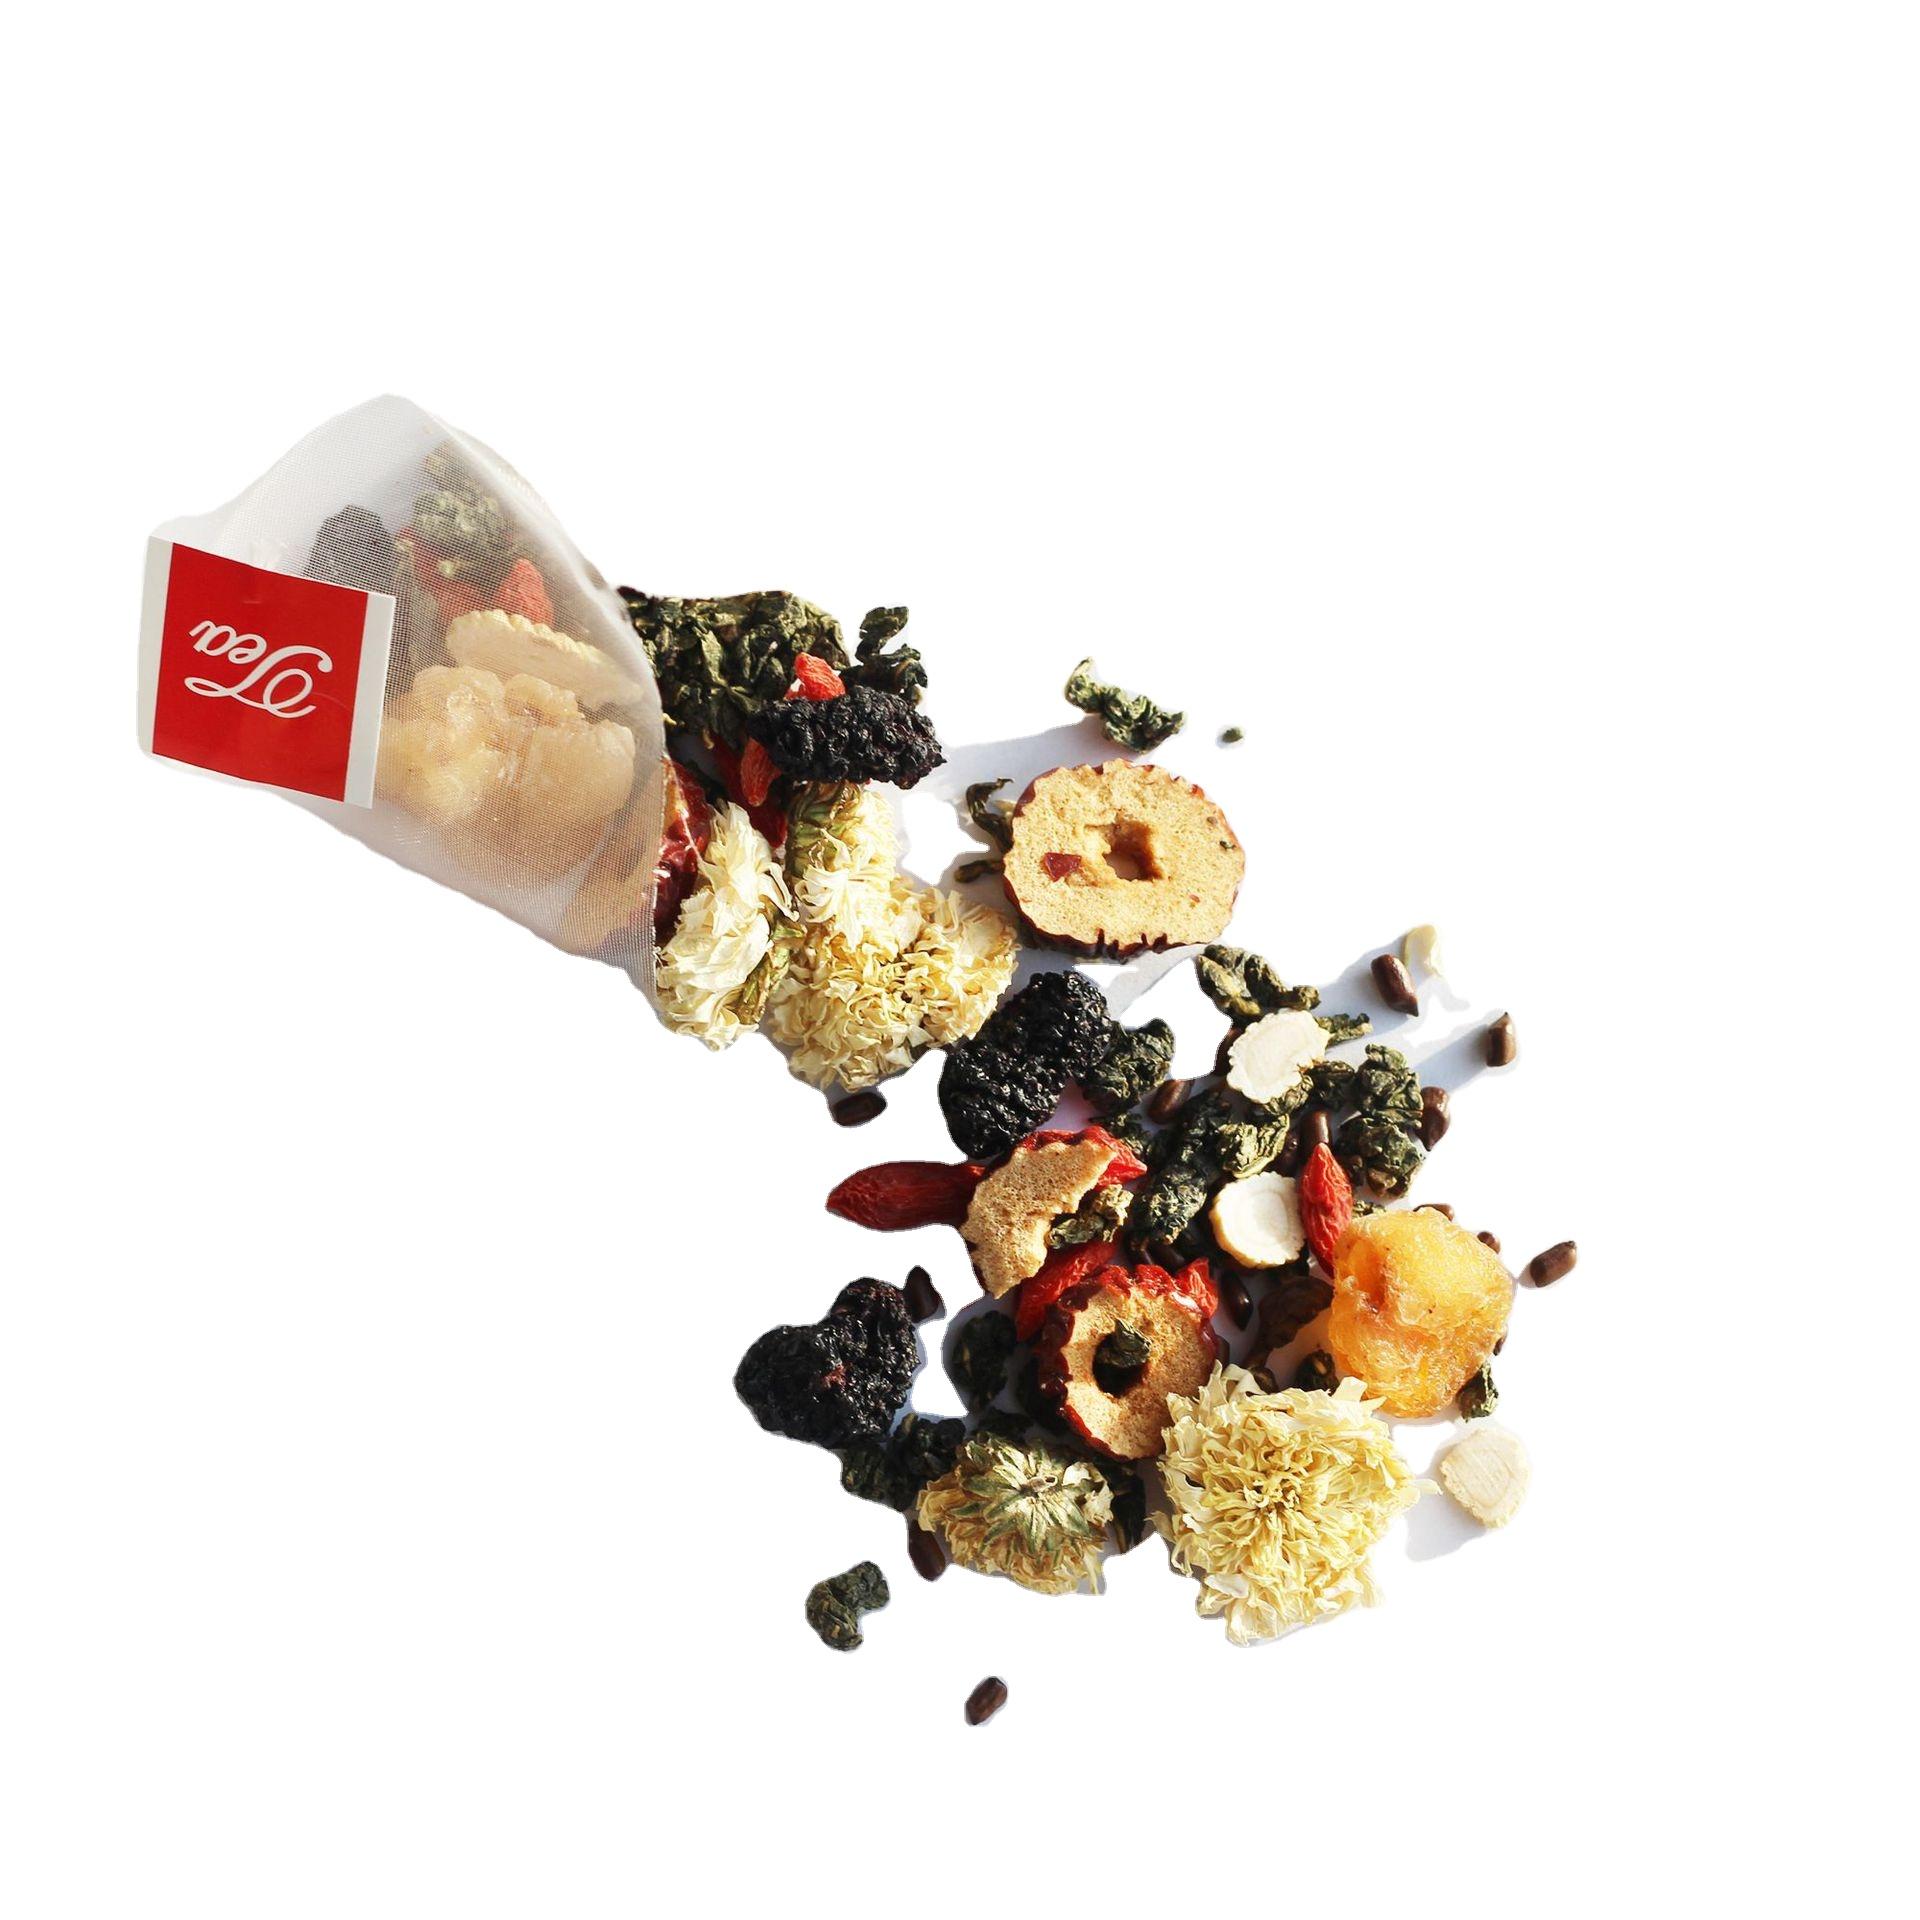 2021New Private Label Organic Blooming Dried Flower Tea Chrysanthemum Mulberry Tea Health in Independent bag - 4uTea   4uTea.com